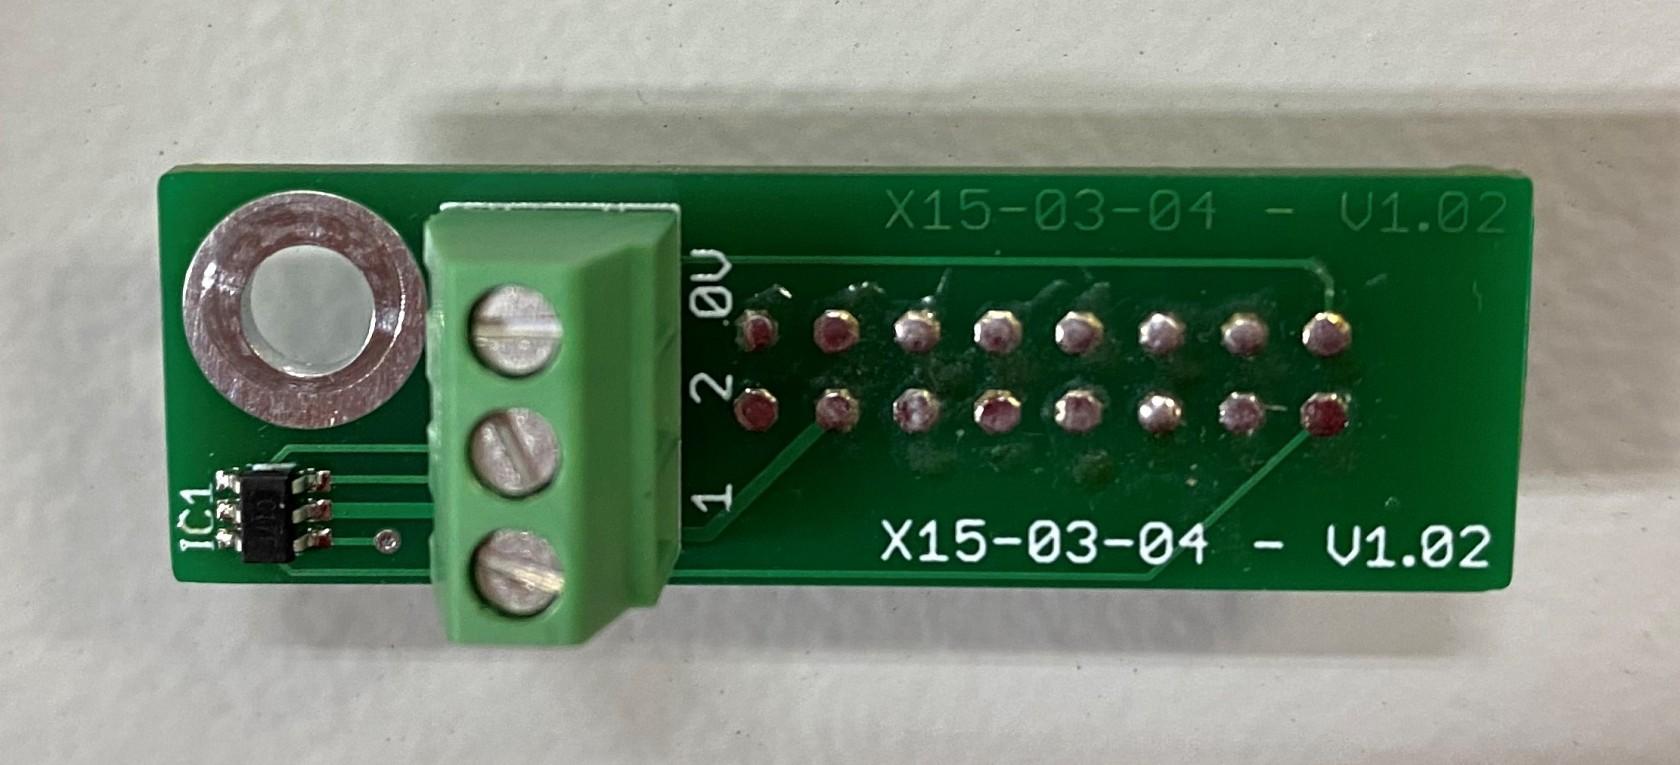 X15-03-04.jpg